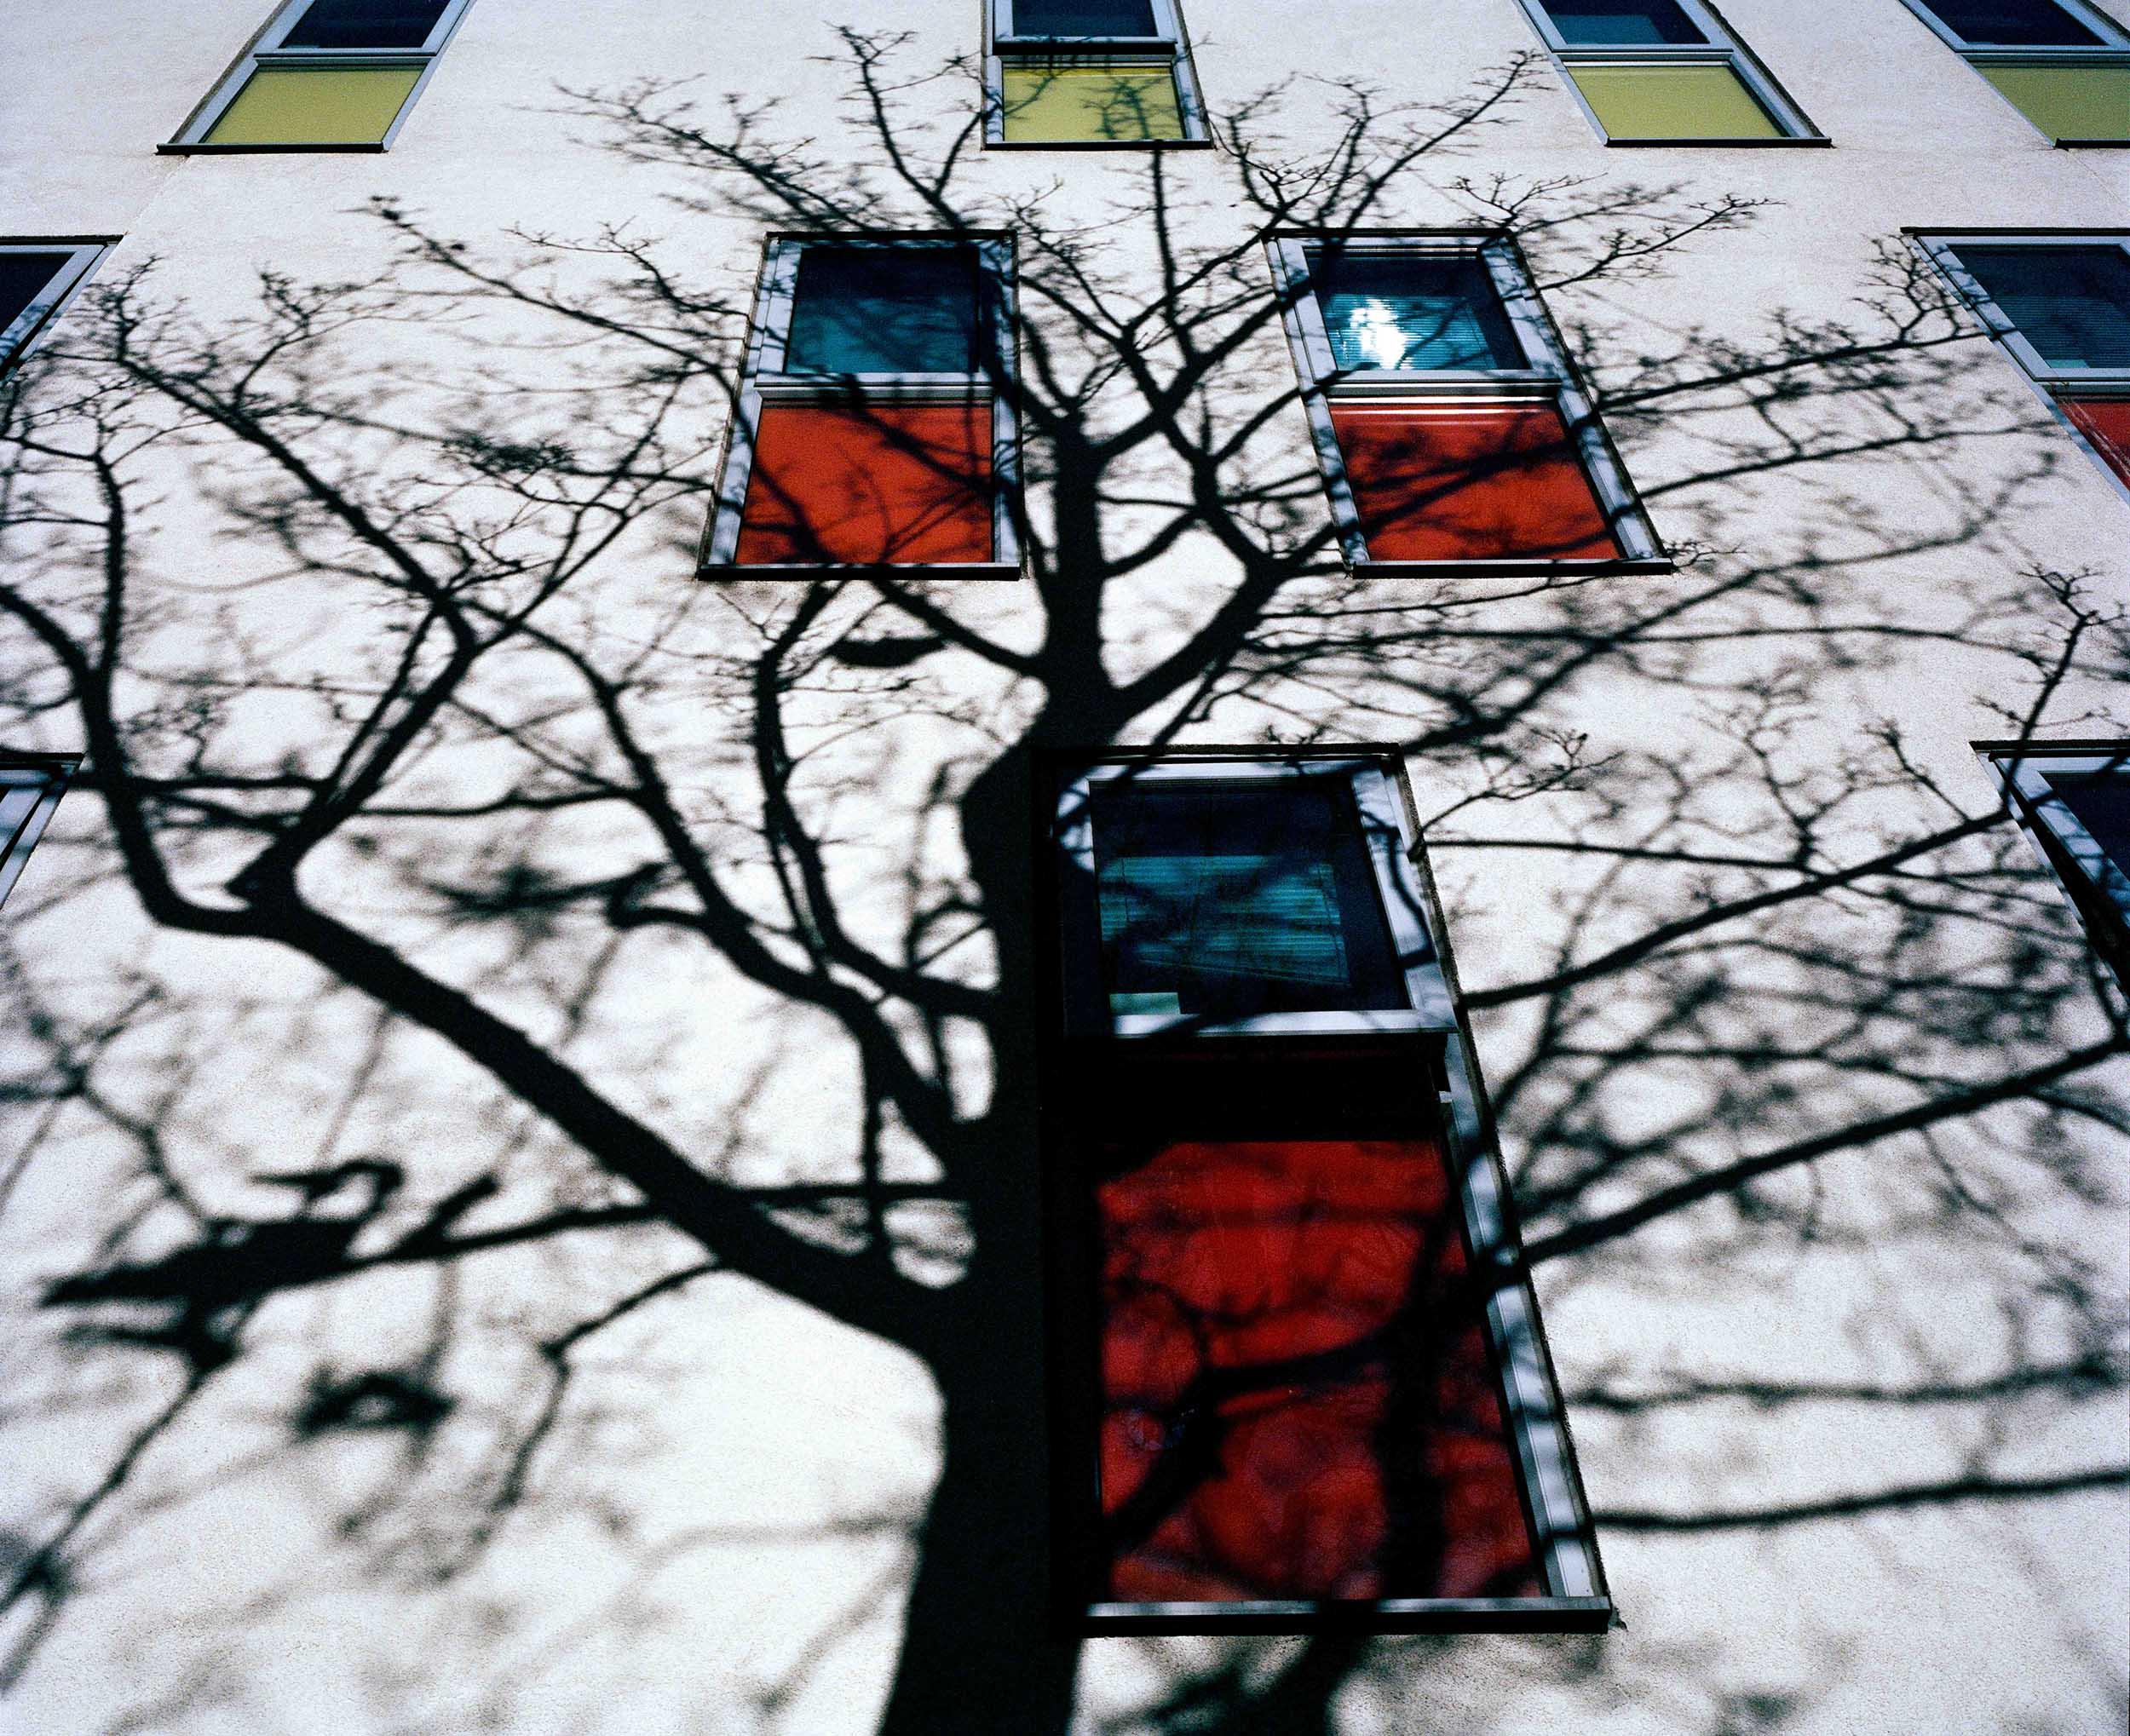 26-blighty-england-london-sam-gregg-photography.jpg